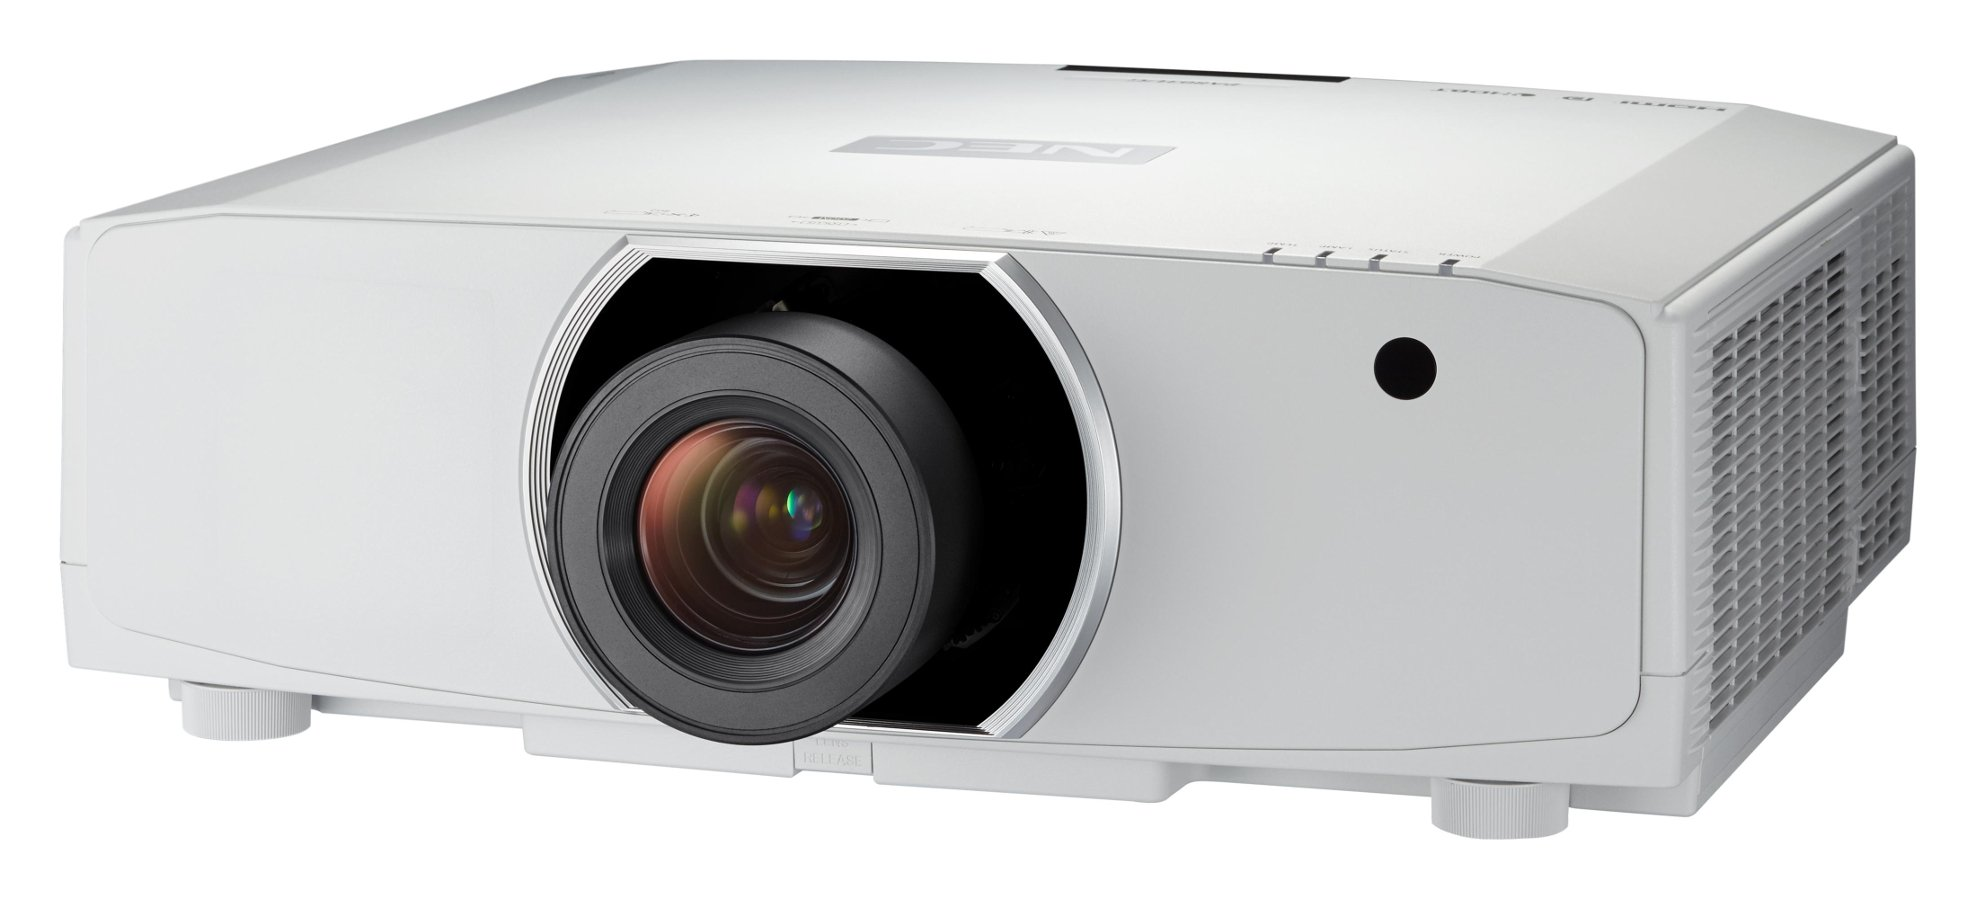 6500 Lumen WUXGA Installation Projector with Lens